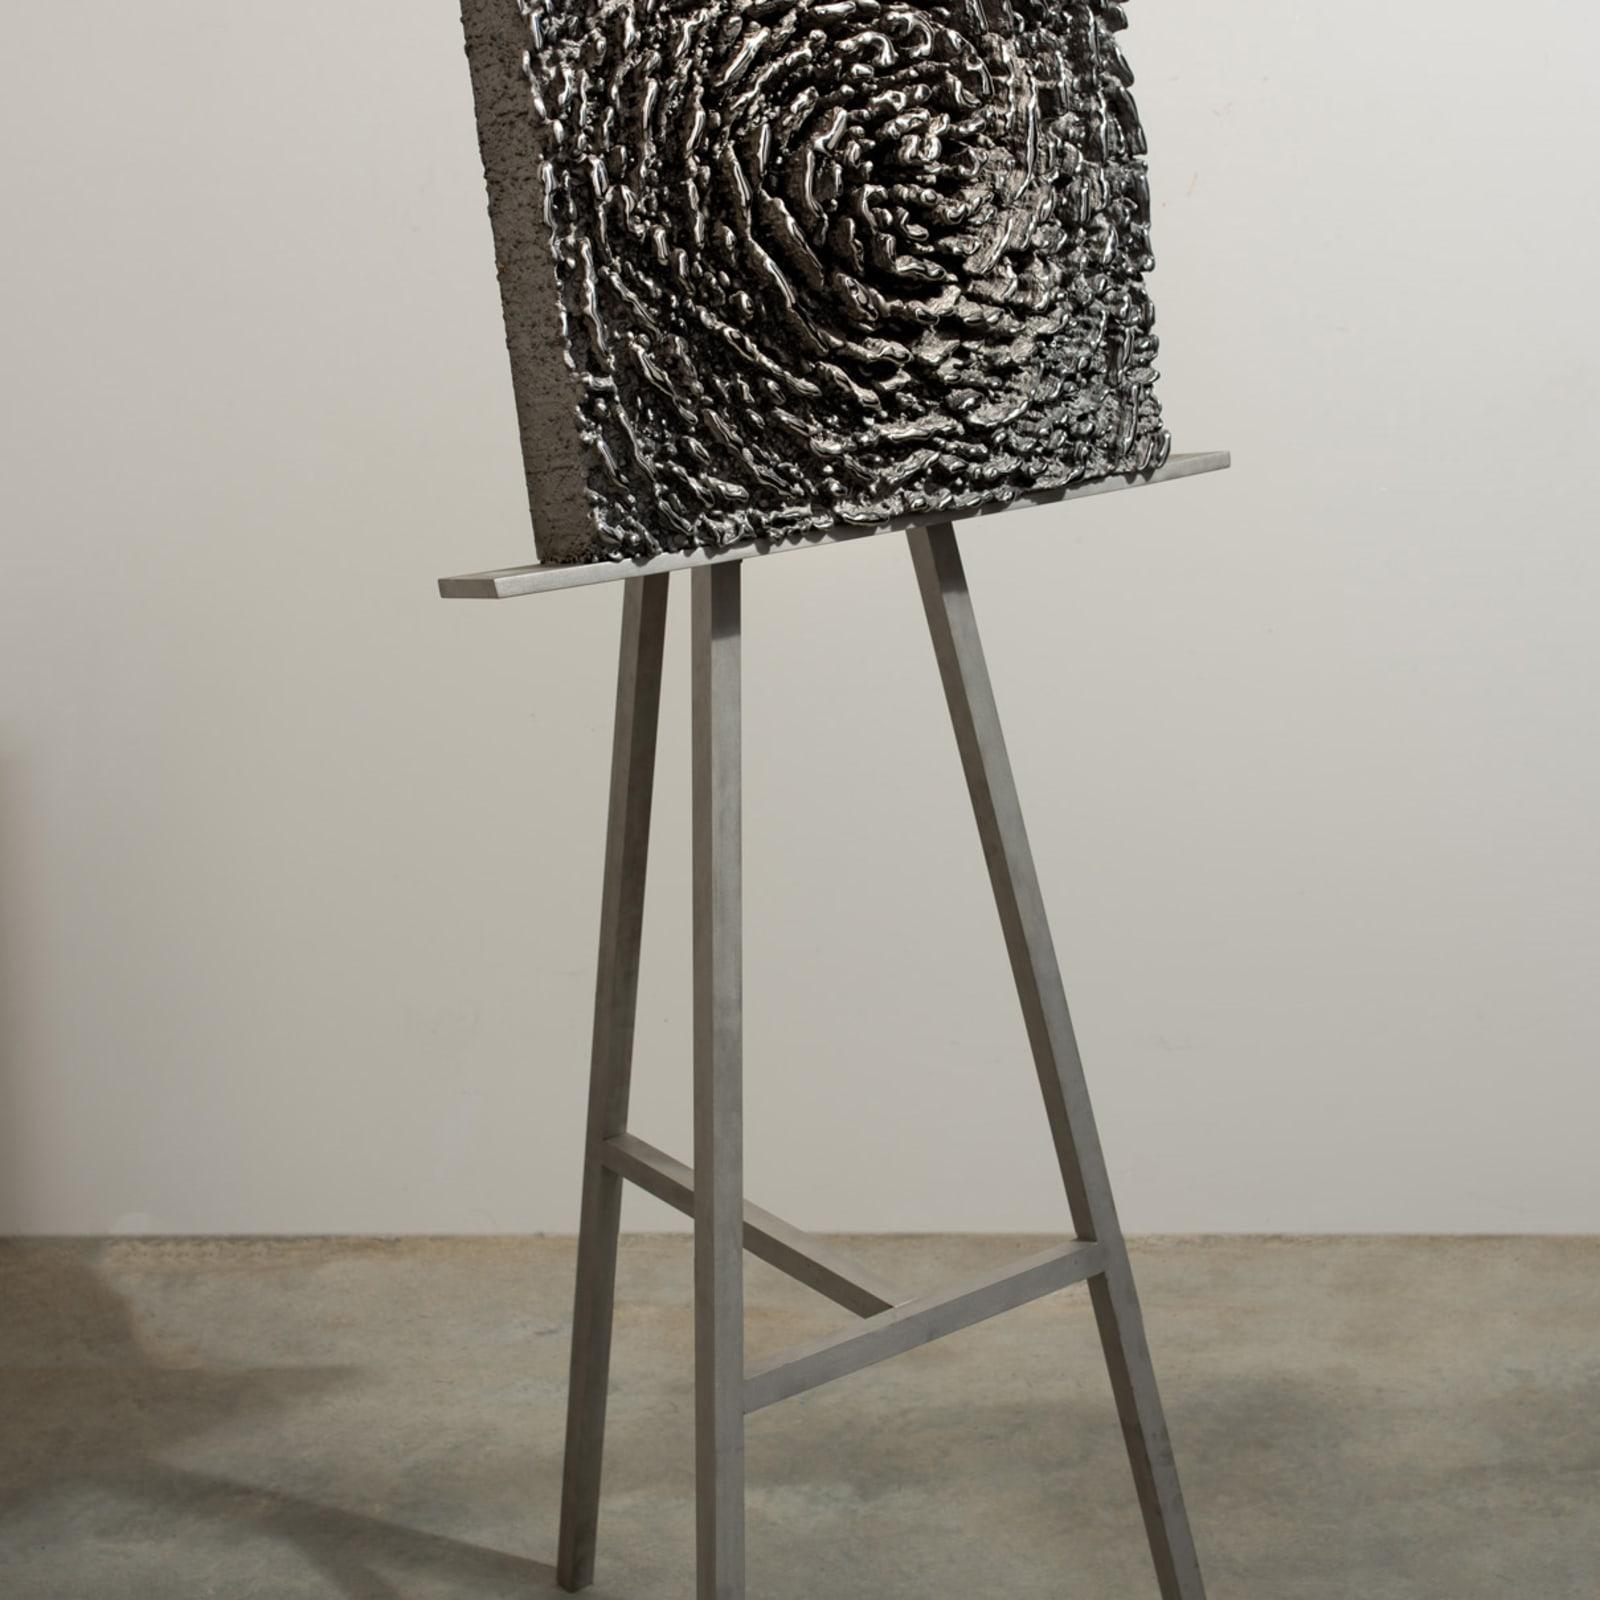 Martin Kline, Vanitas (Stainless Bloom on Easel)